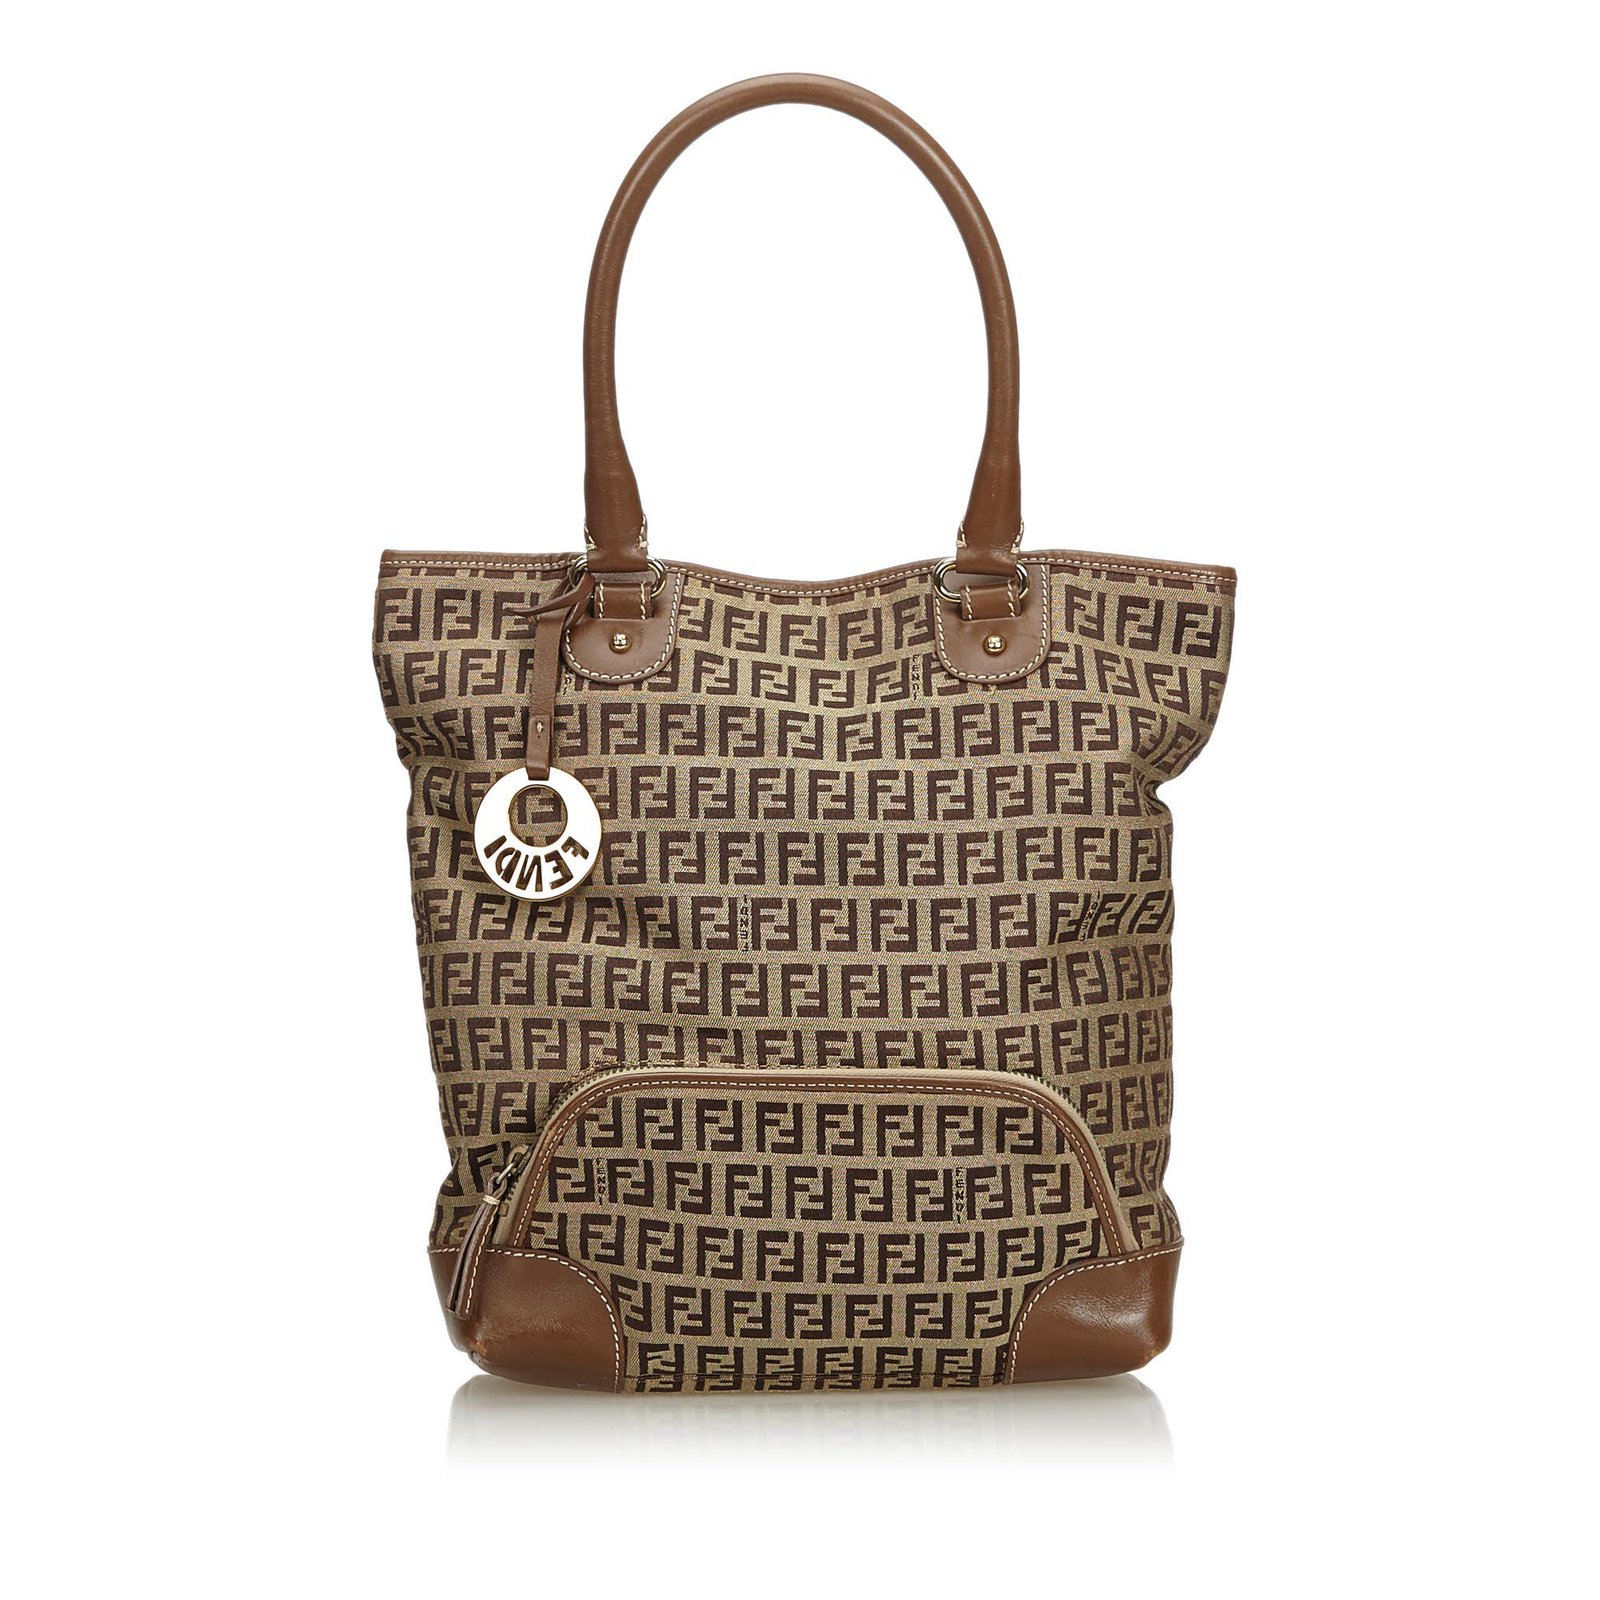 3162bdaac71e Fendi Zucca Jacquard Tote Bag Totes Leather